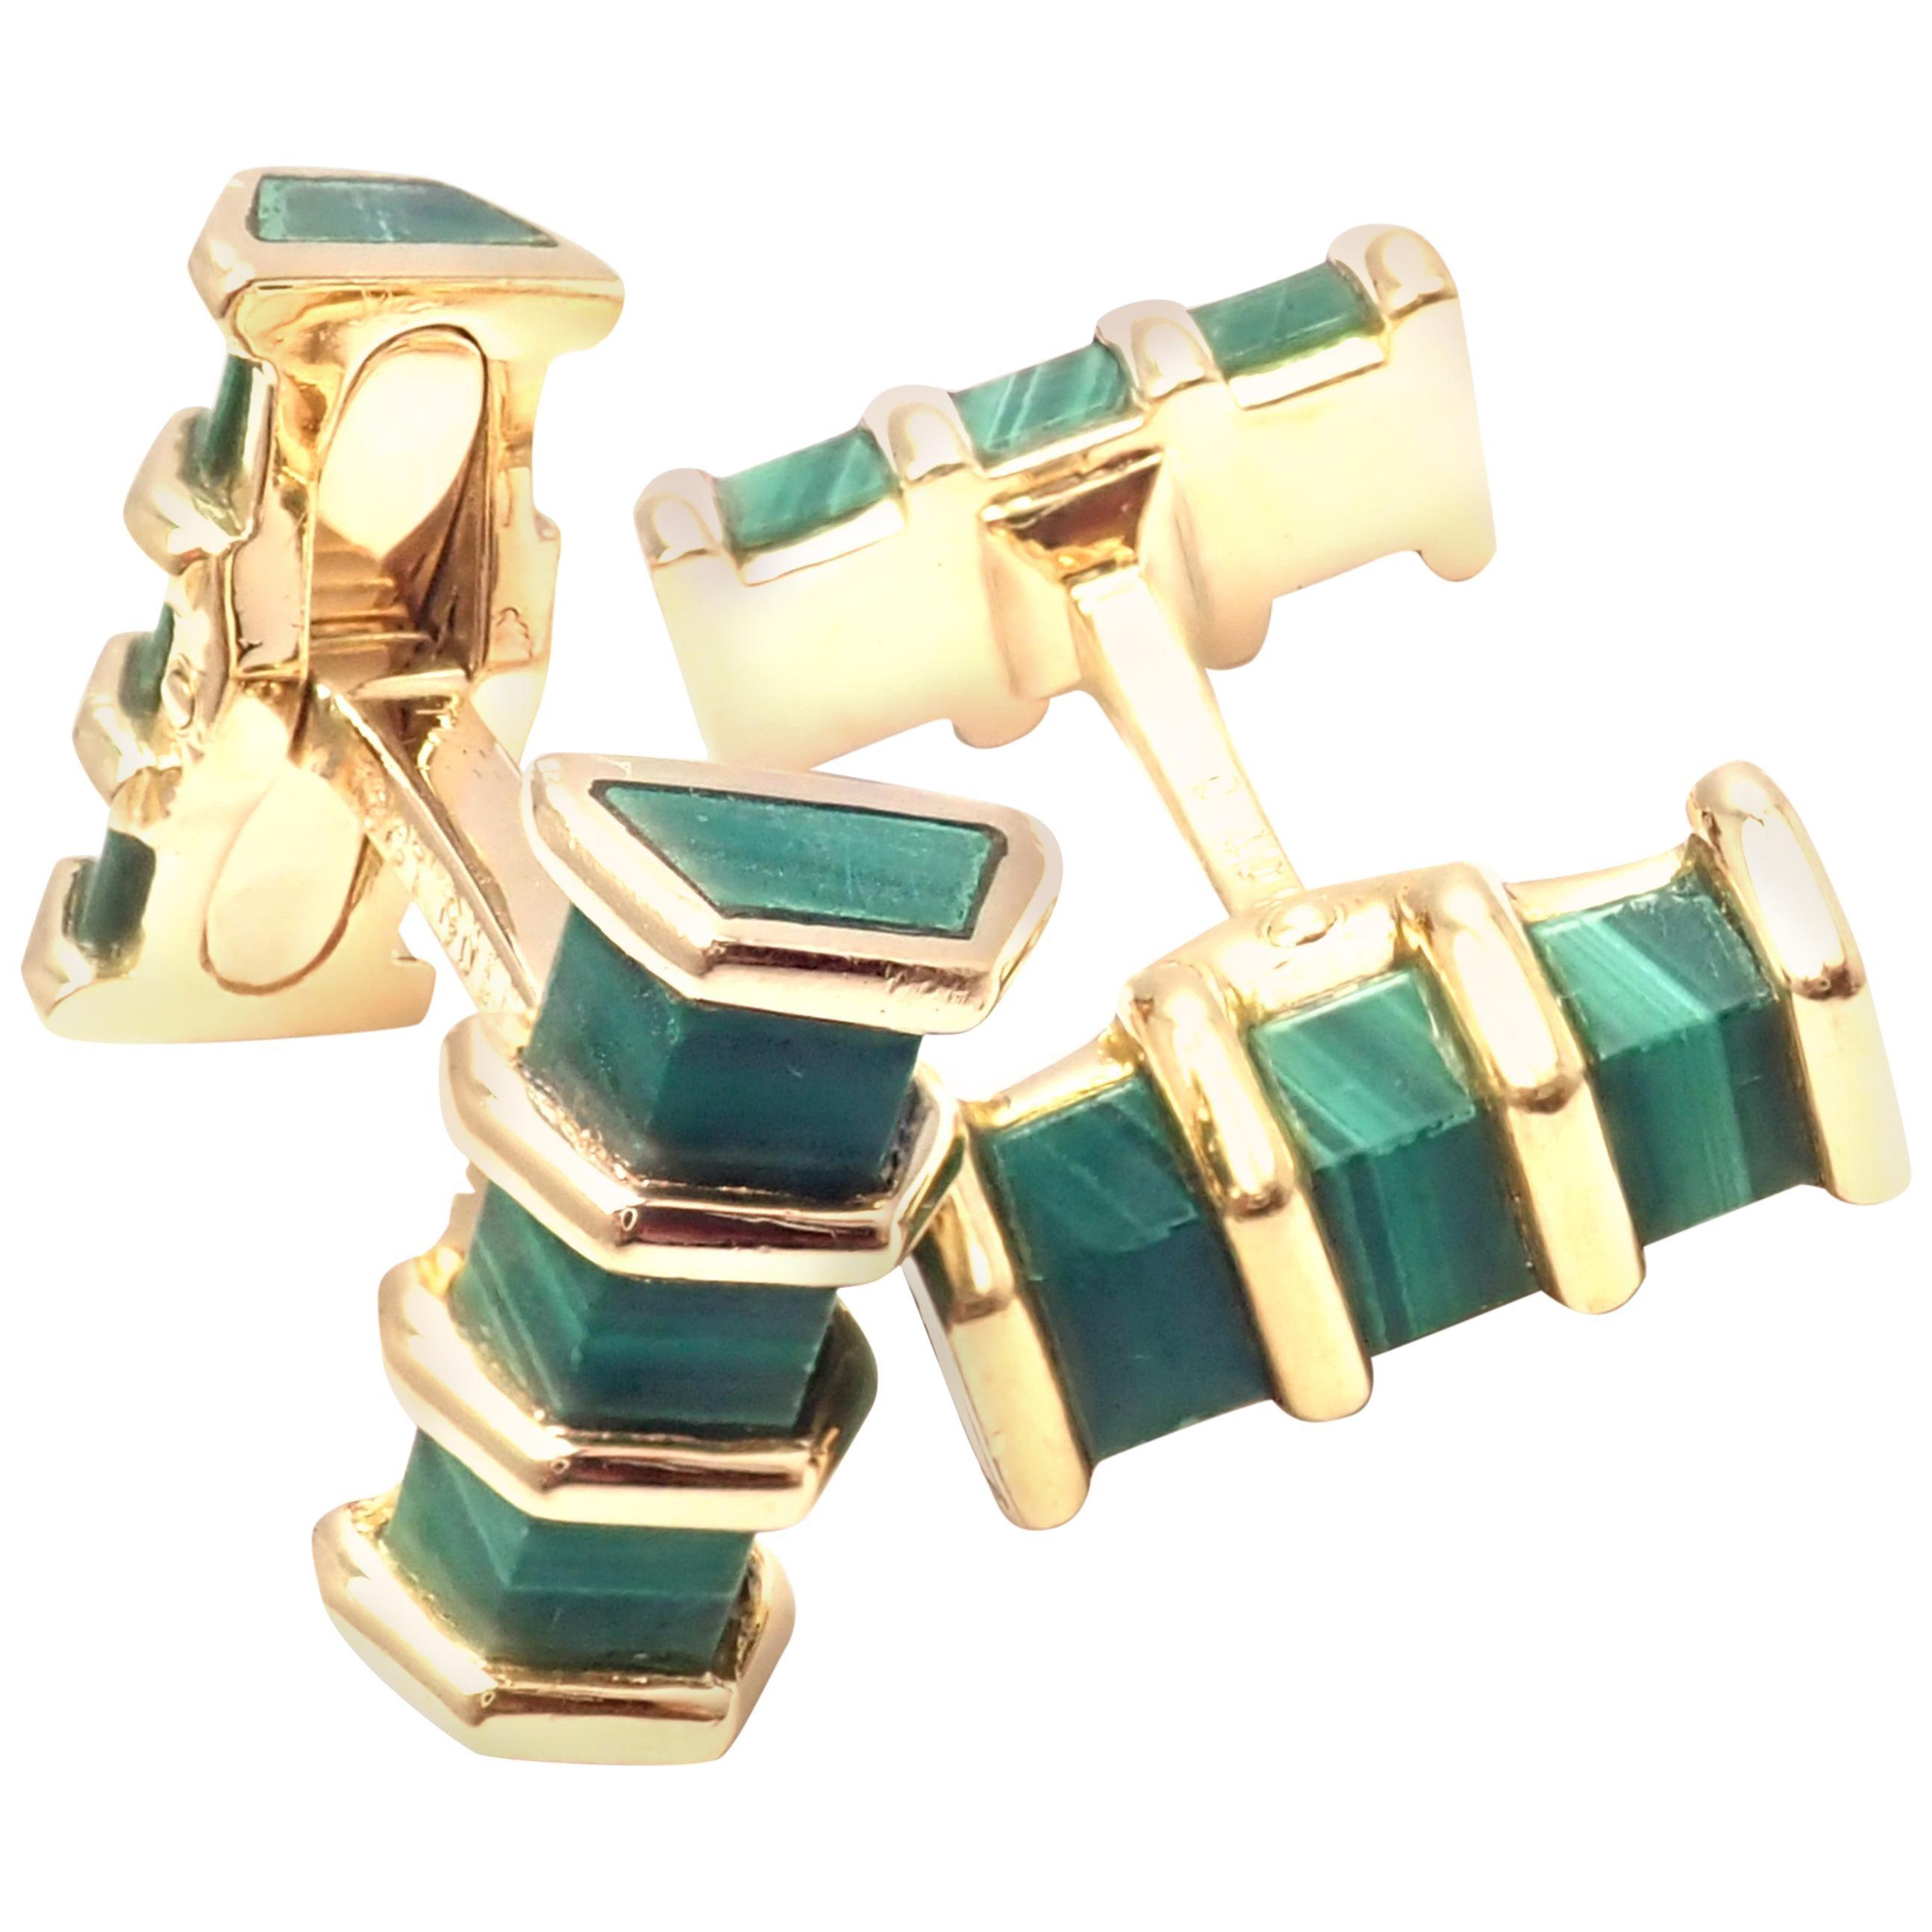 Tiffany & Co France Malachite Yellow Gold Cufflinks